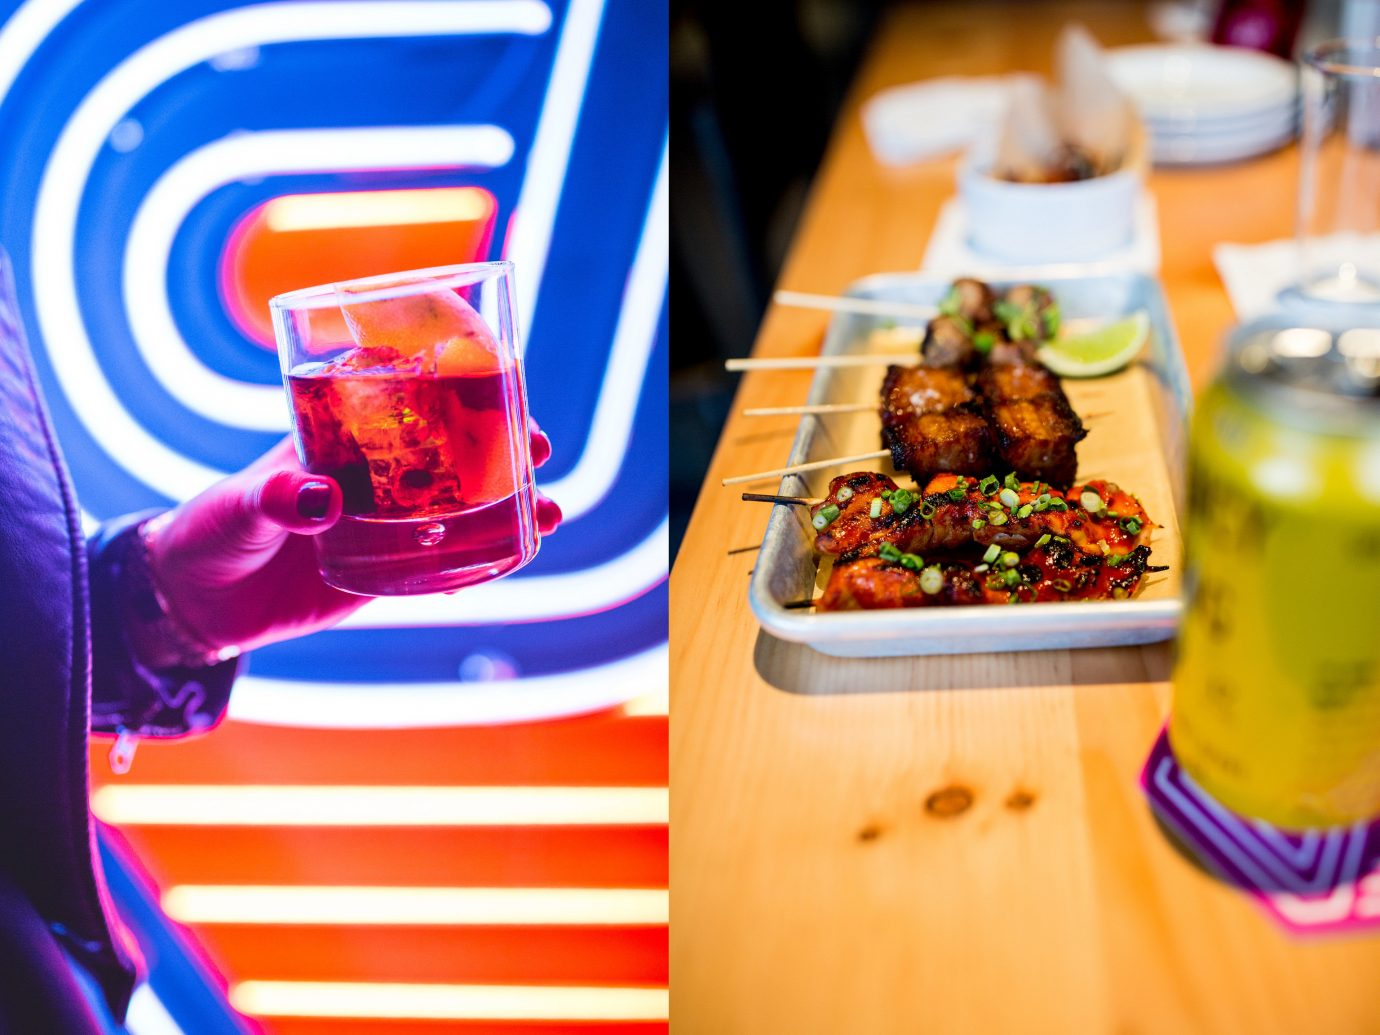 Food + Drink food color indoor dish meal sense Party Drink